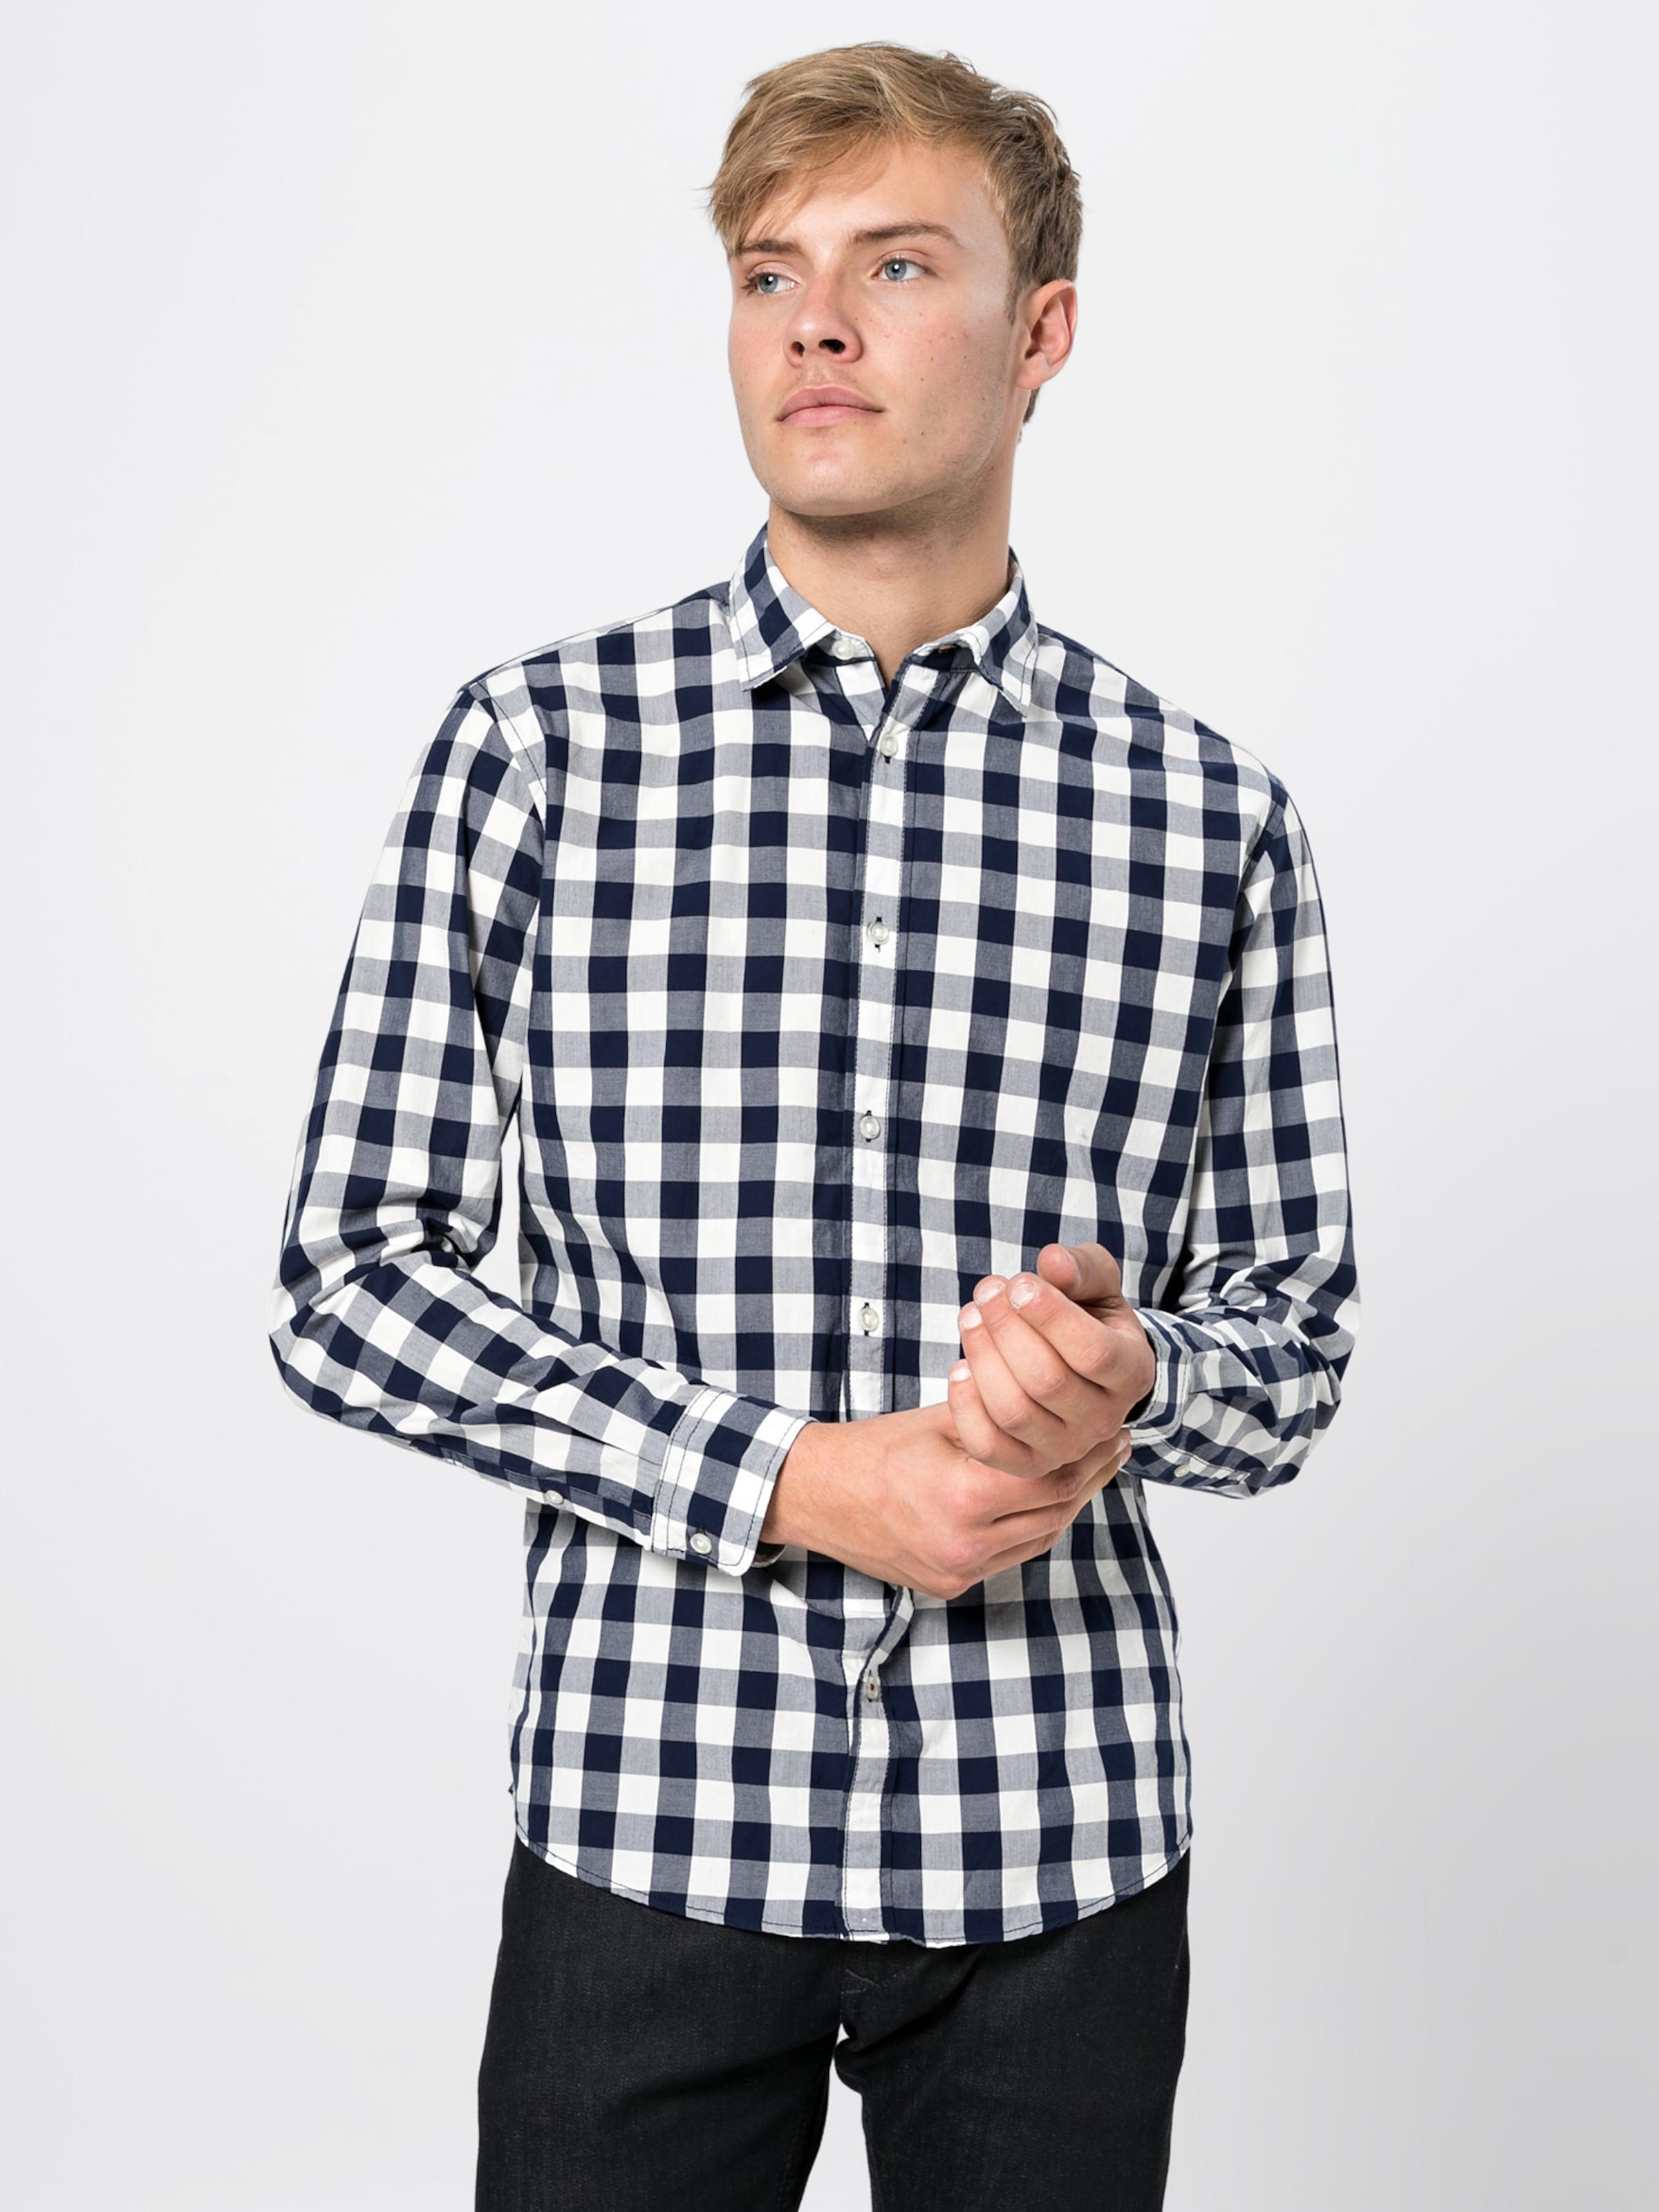 L Jackamp; Hemd 'jjegingham In Jones Shirt s' NachtblauWeiß BsQthrdCxo